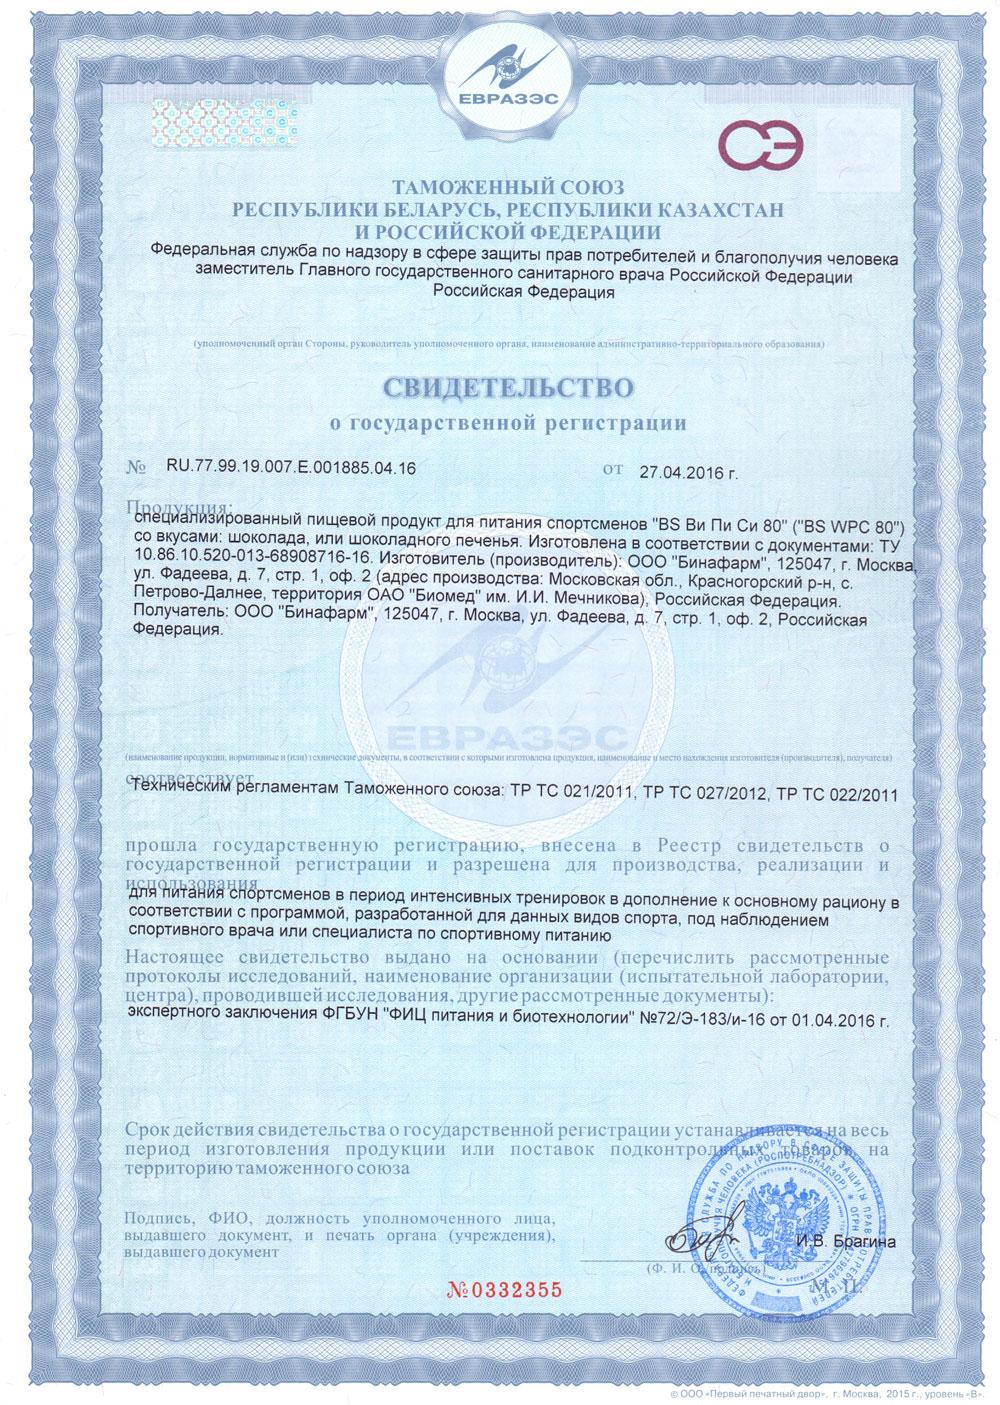 Сертификат ВПС-80